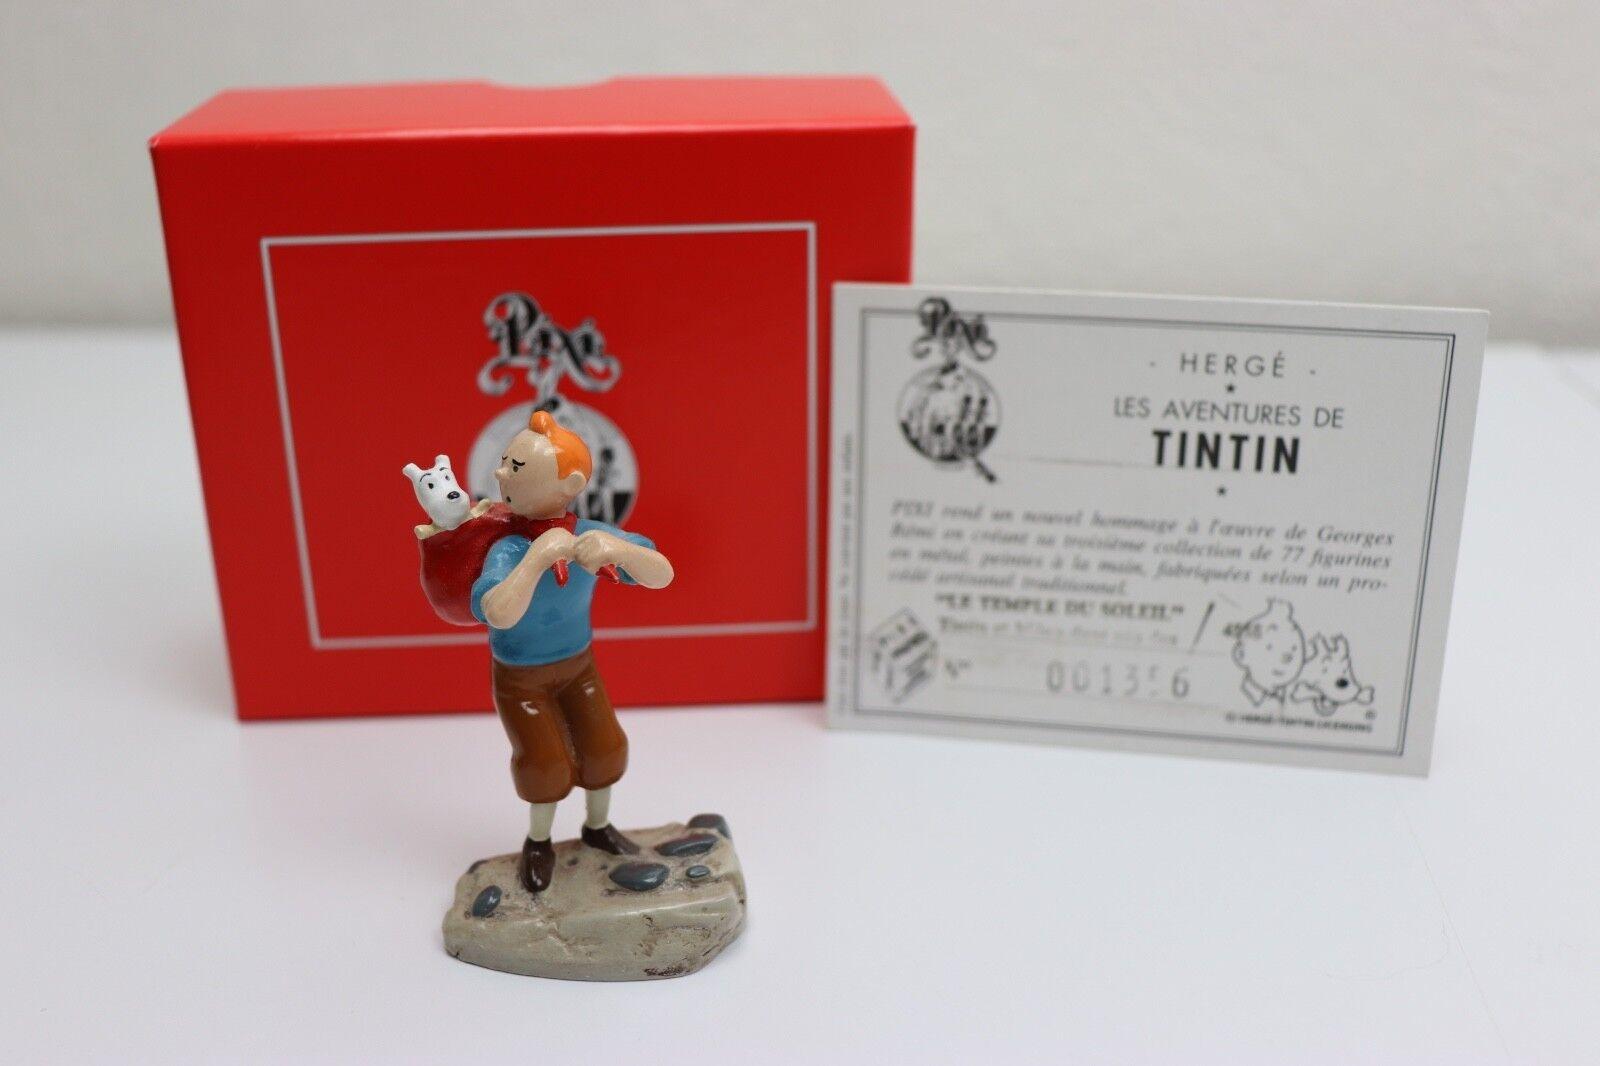 cómodamente Tintin milou dos dos dos pixi tim struppi Kuifje Bienlein aroutcheff Leblon  ofreciendo 100%